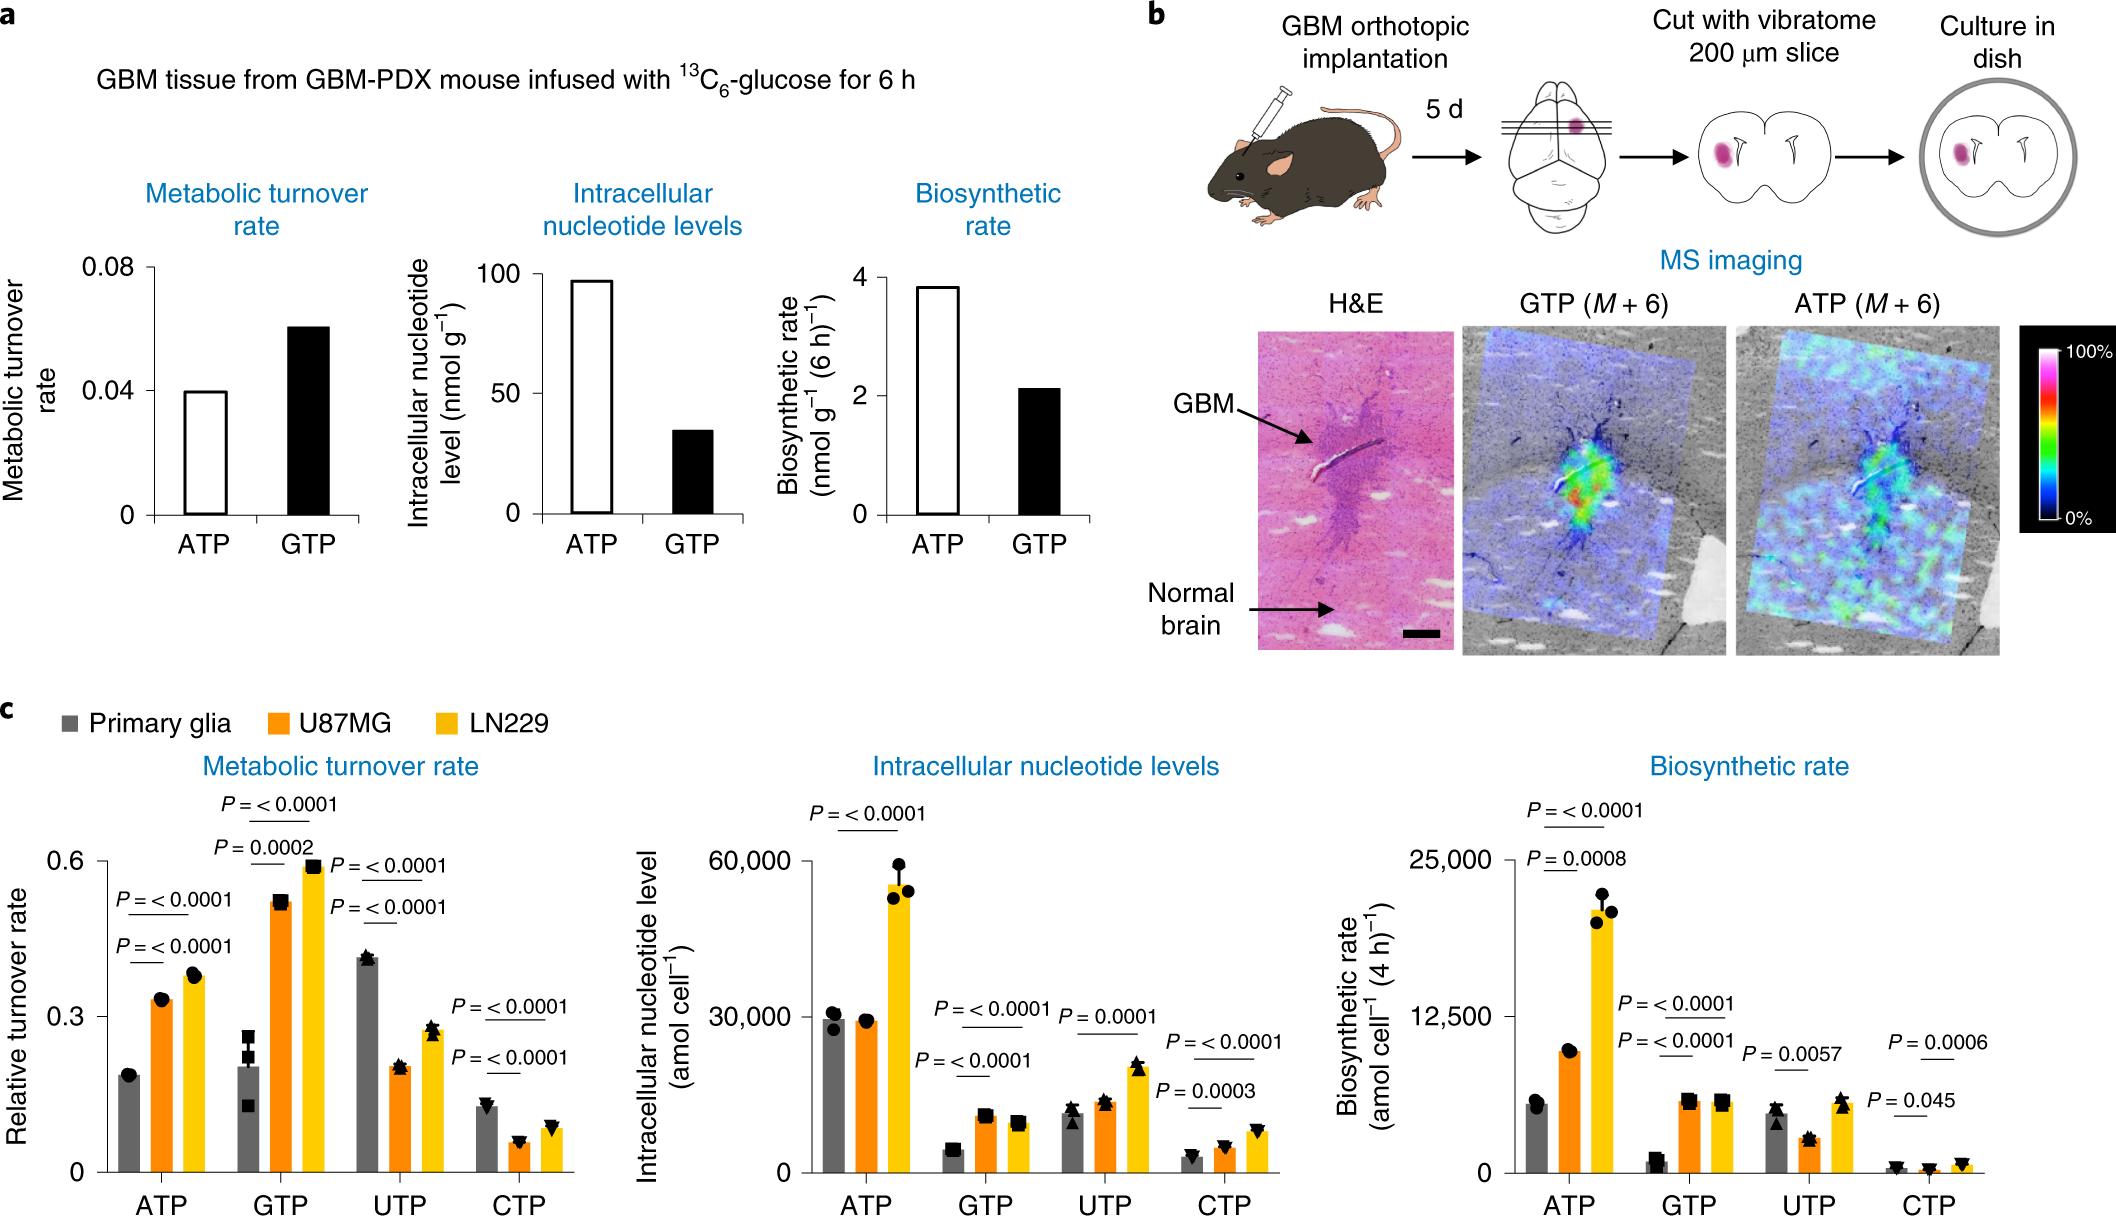 IMP dehydrogenase-2 drives aberrant nucleolar activity and